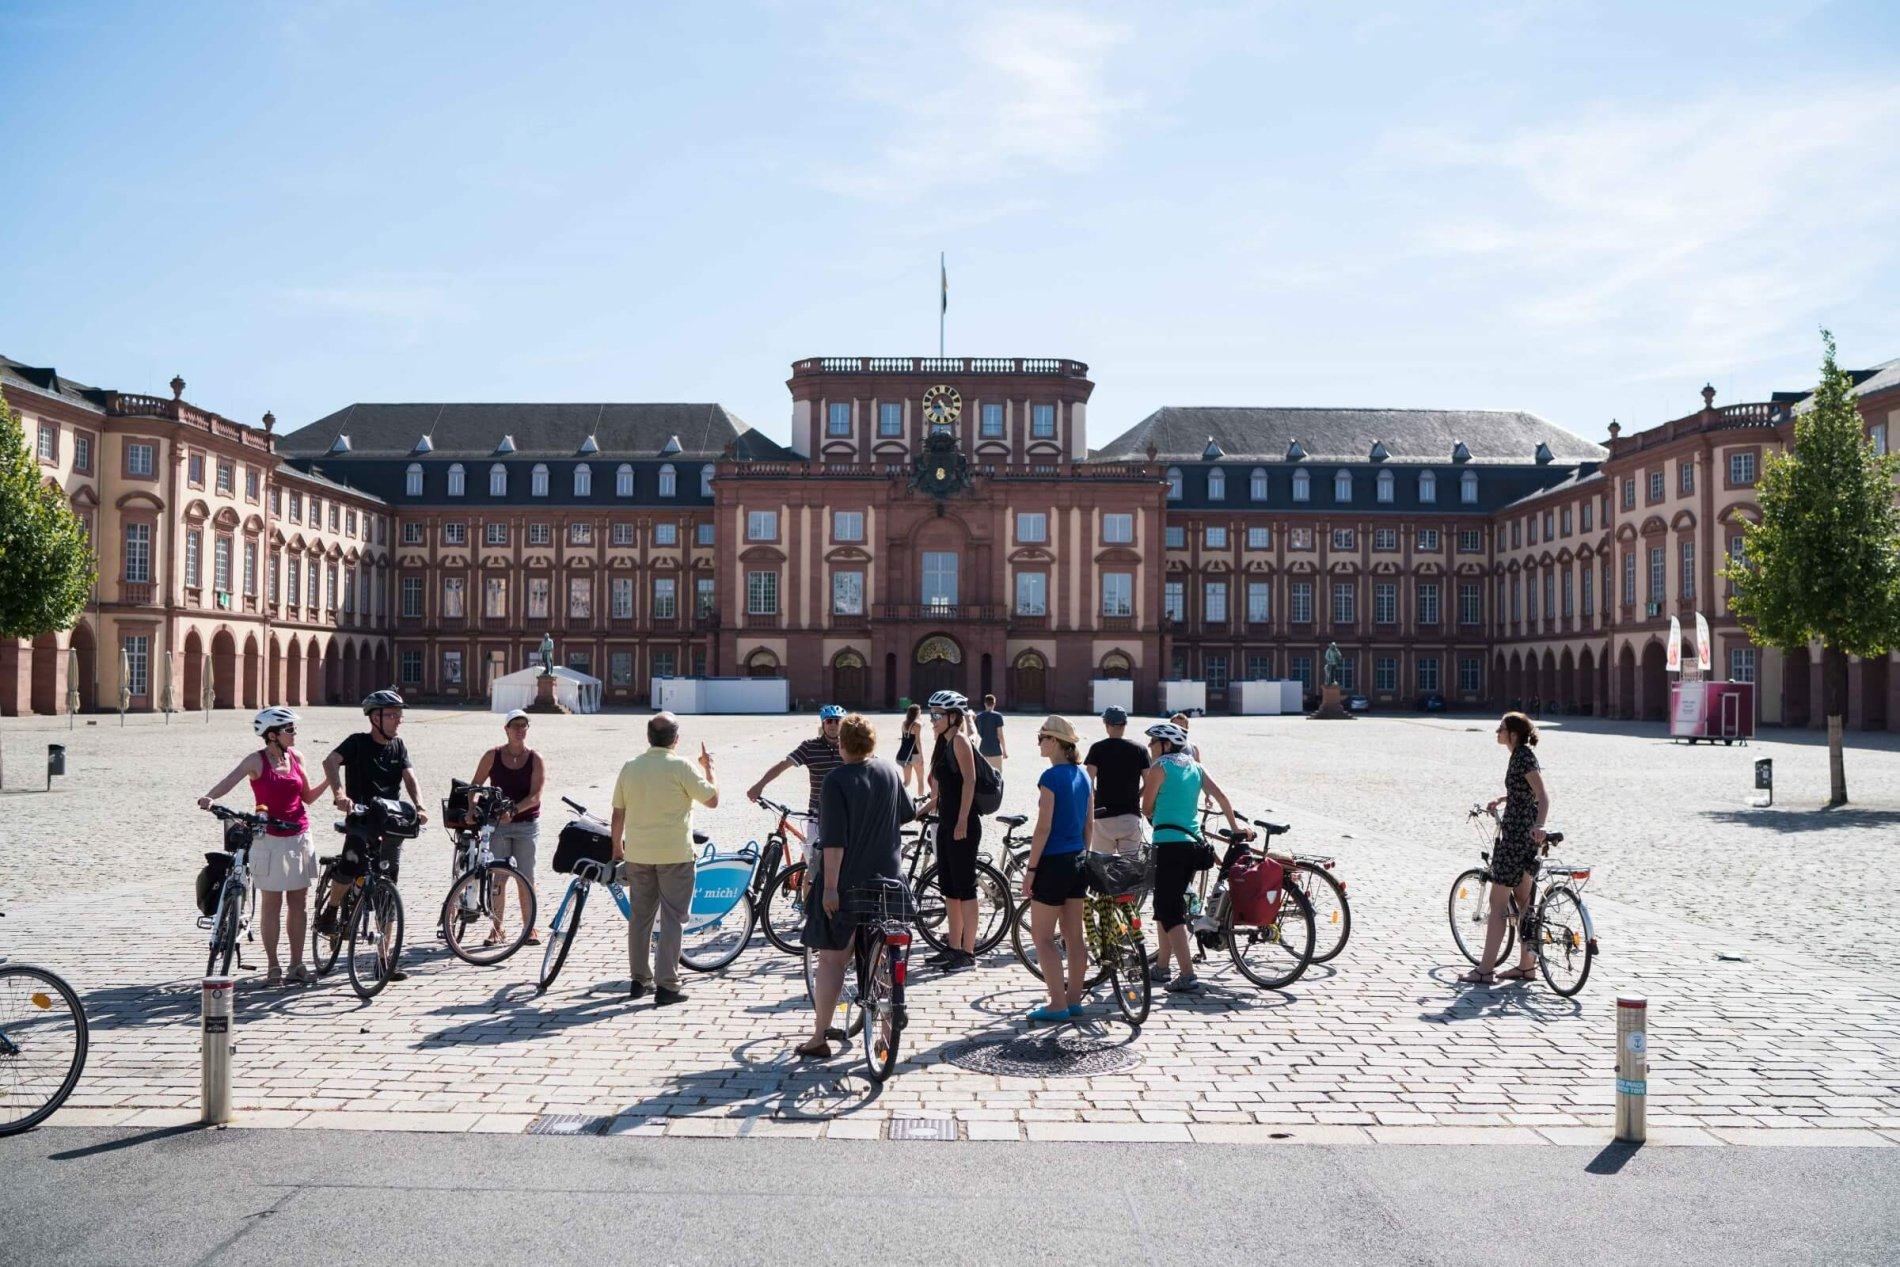 Ehrenhof des Mannheimer Barockschlosses